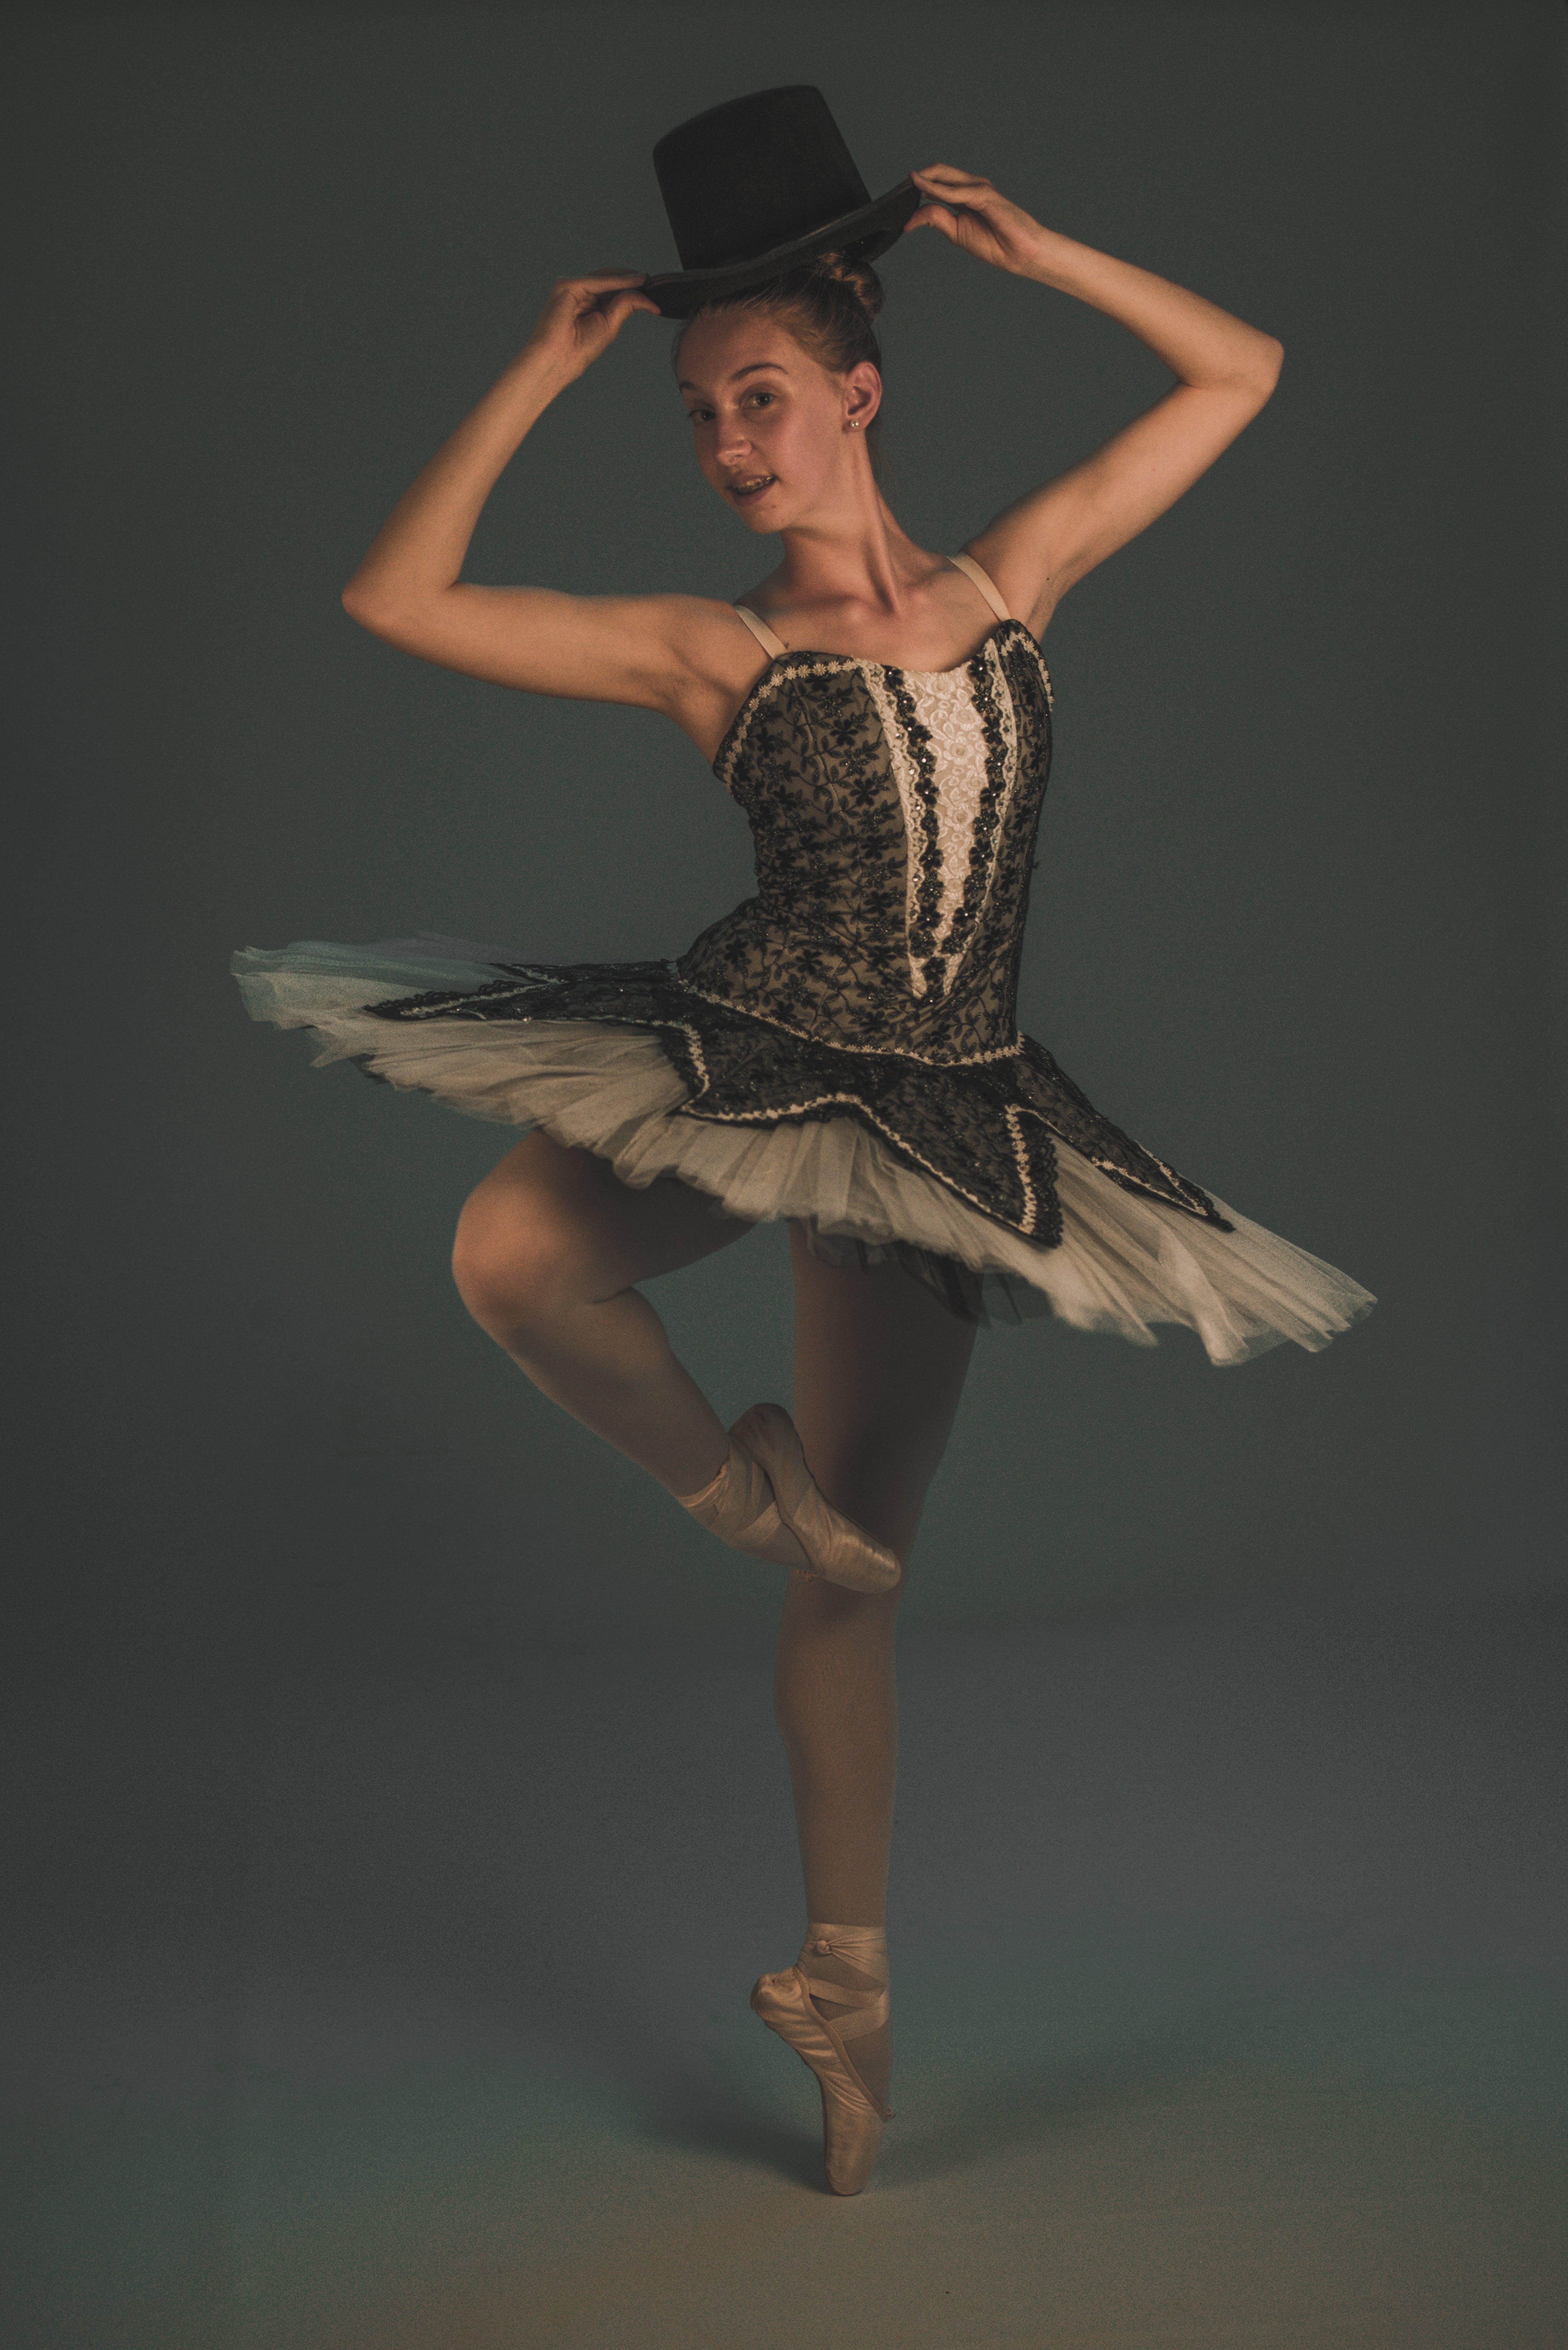 Ballerina in Dance Form Holding Her Black Hat